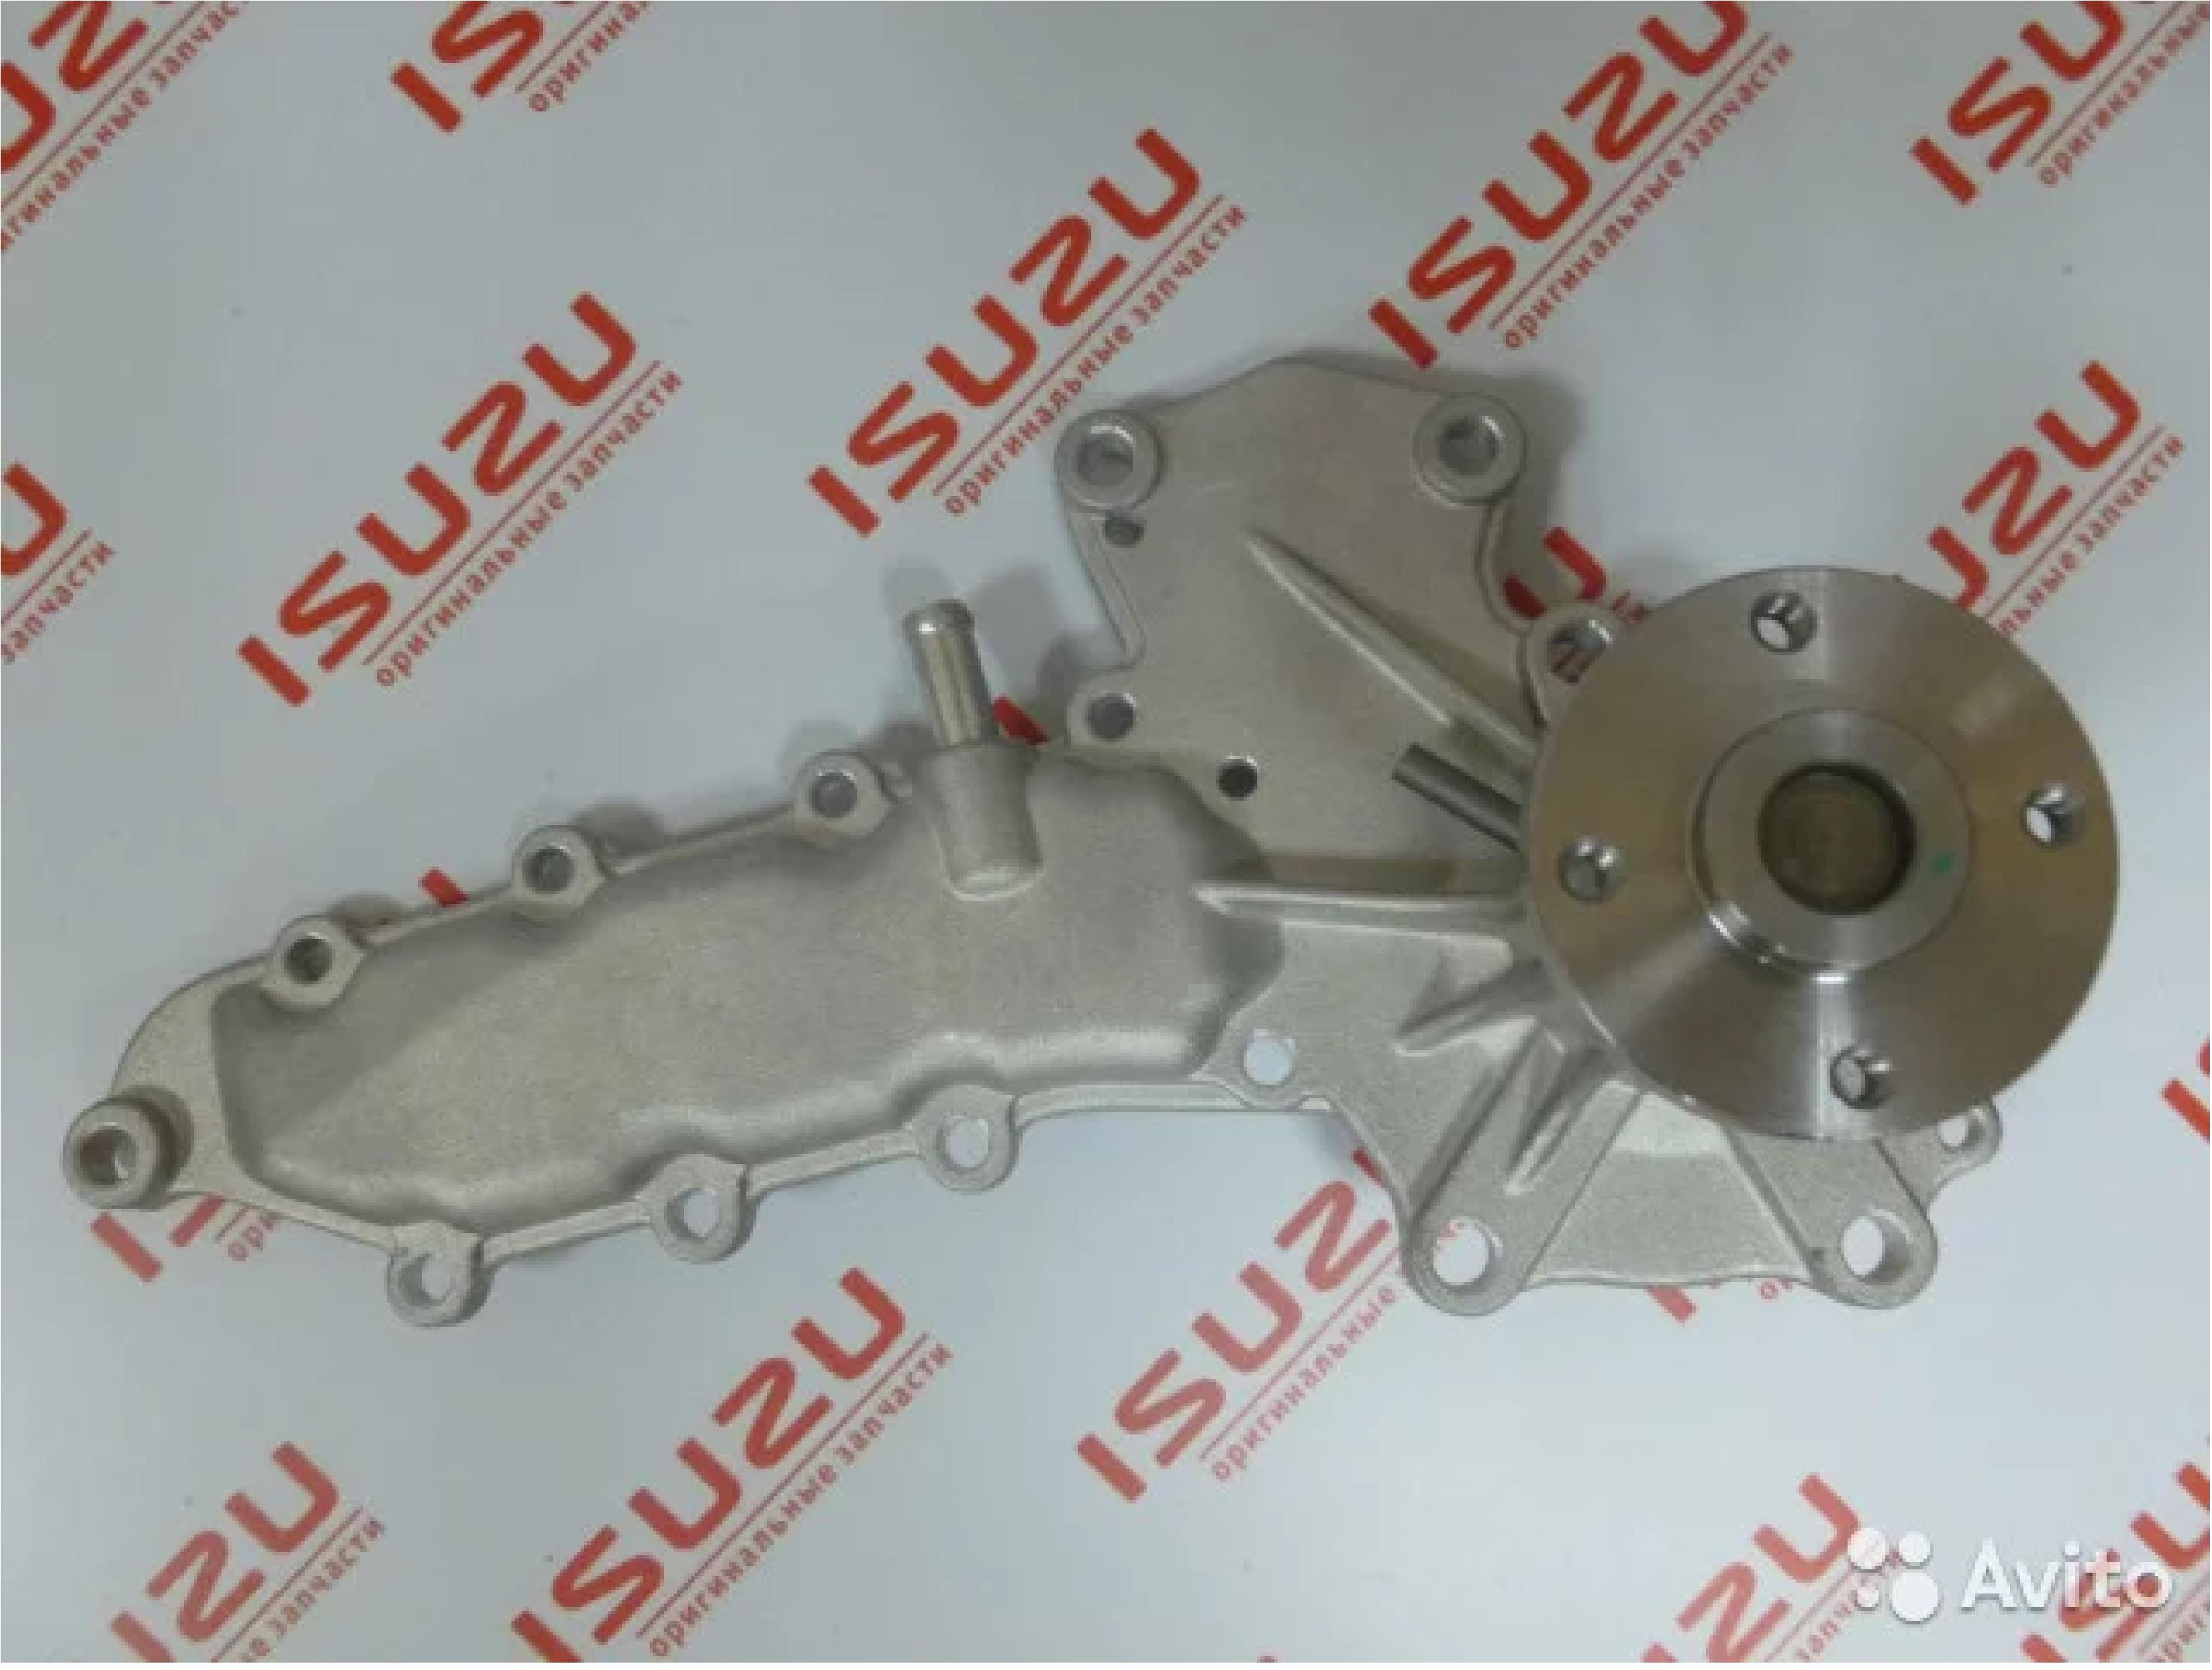 Помпа двигателя Bobcat/Kubota V2203 1E017-73032